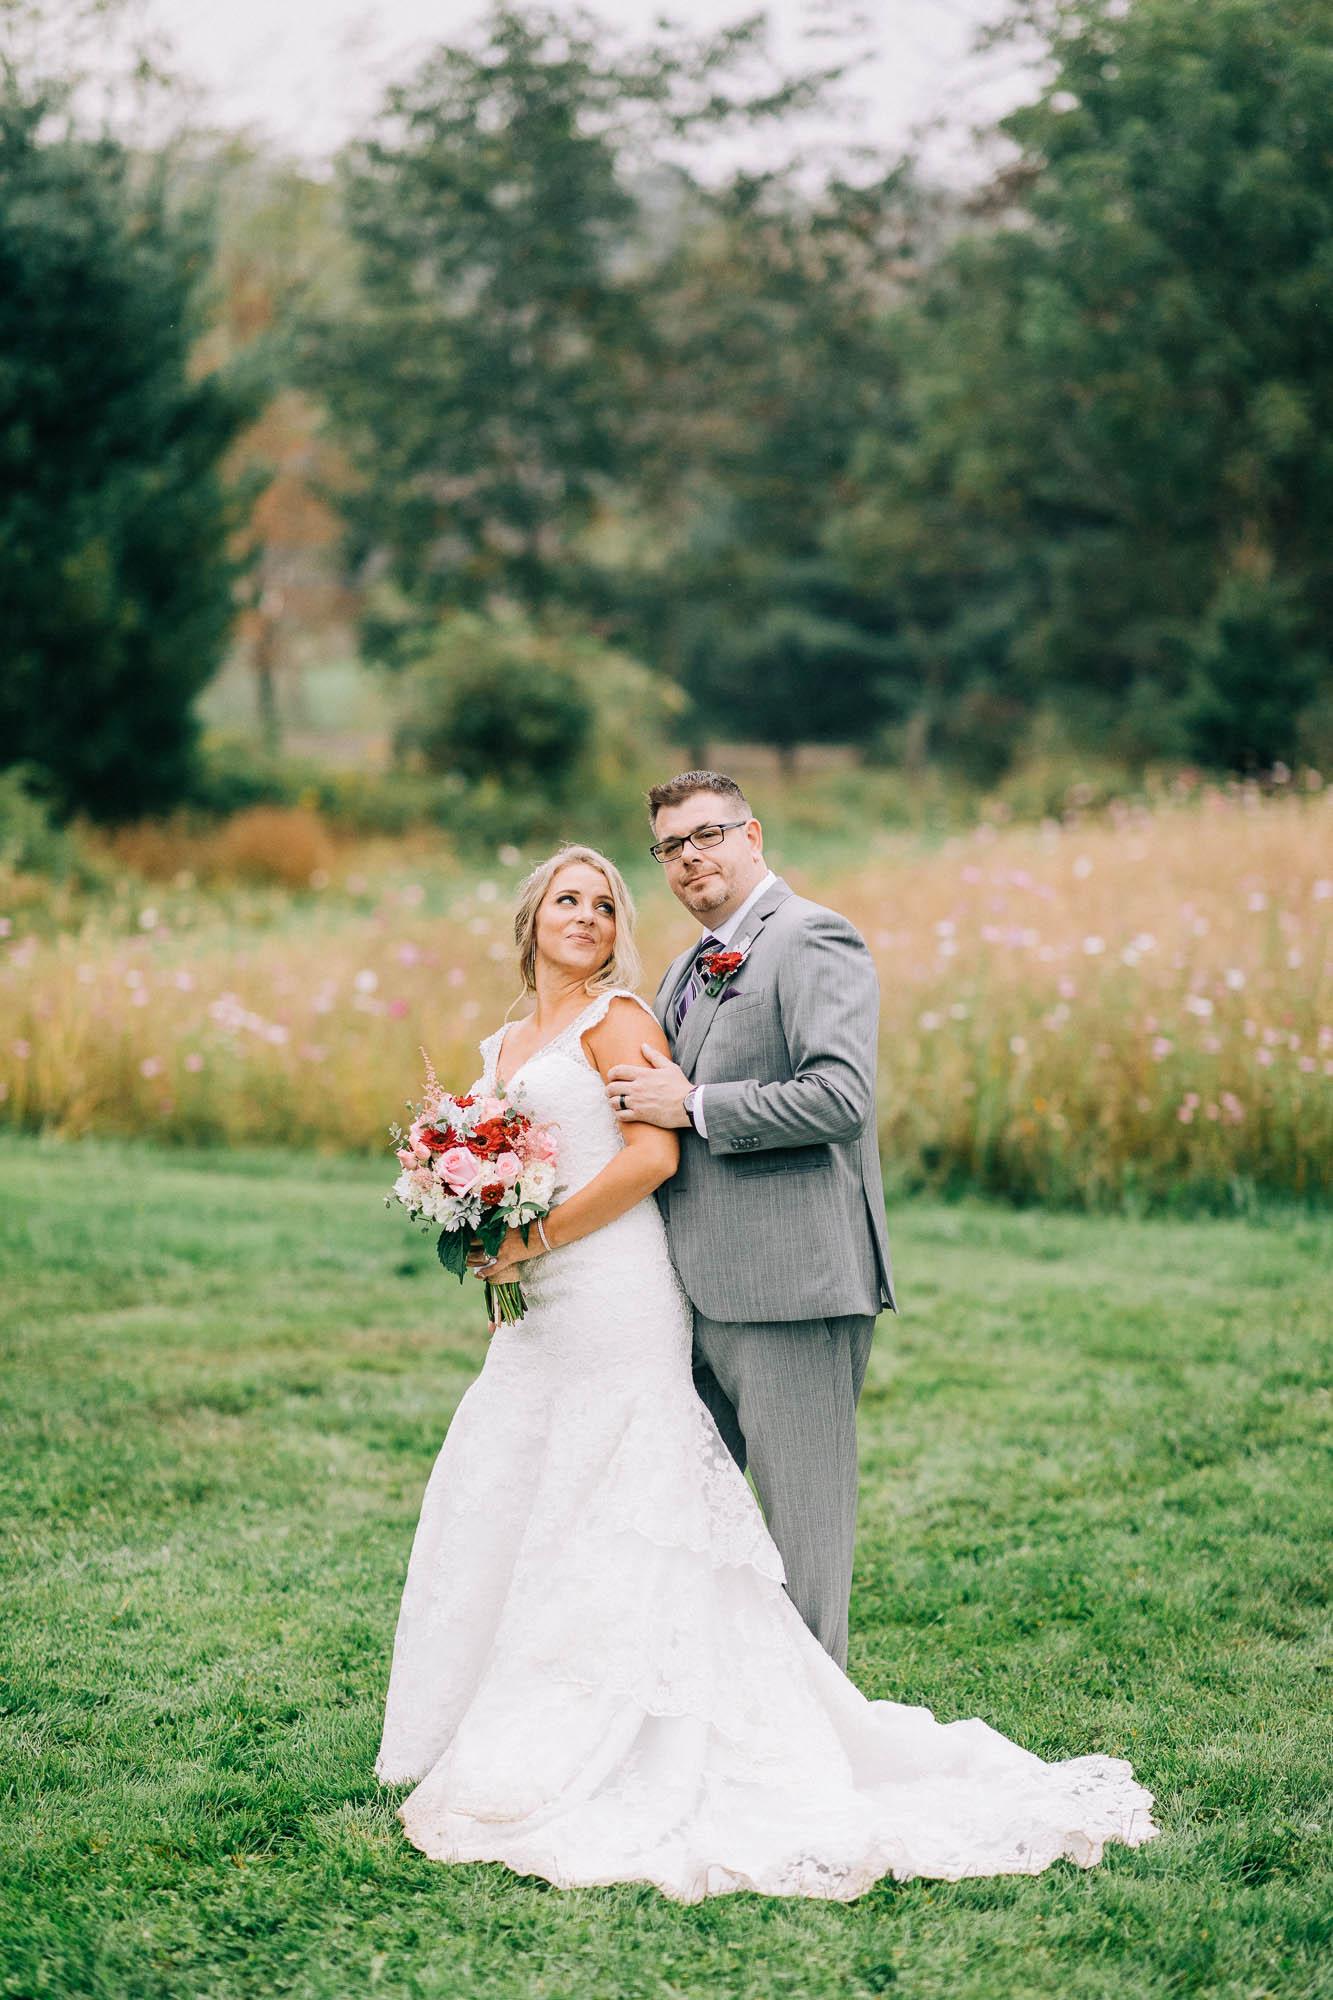 Lodge-at-Raven-Creek-October-wedding-52.jpg